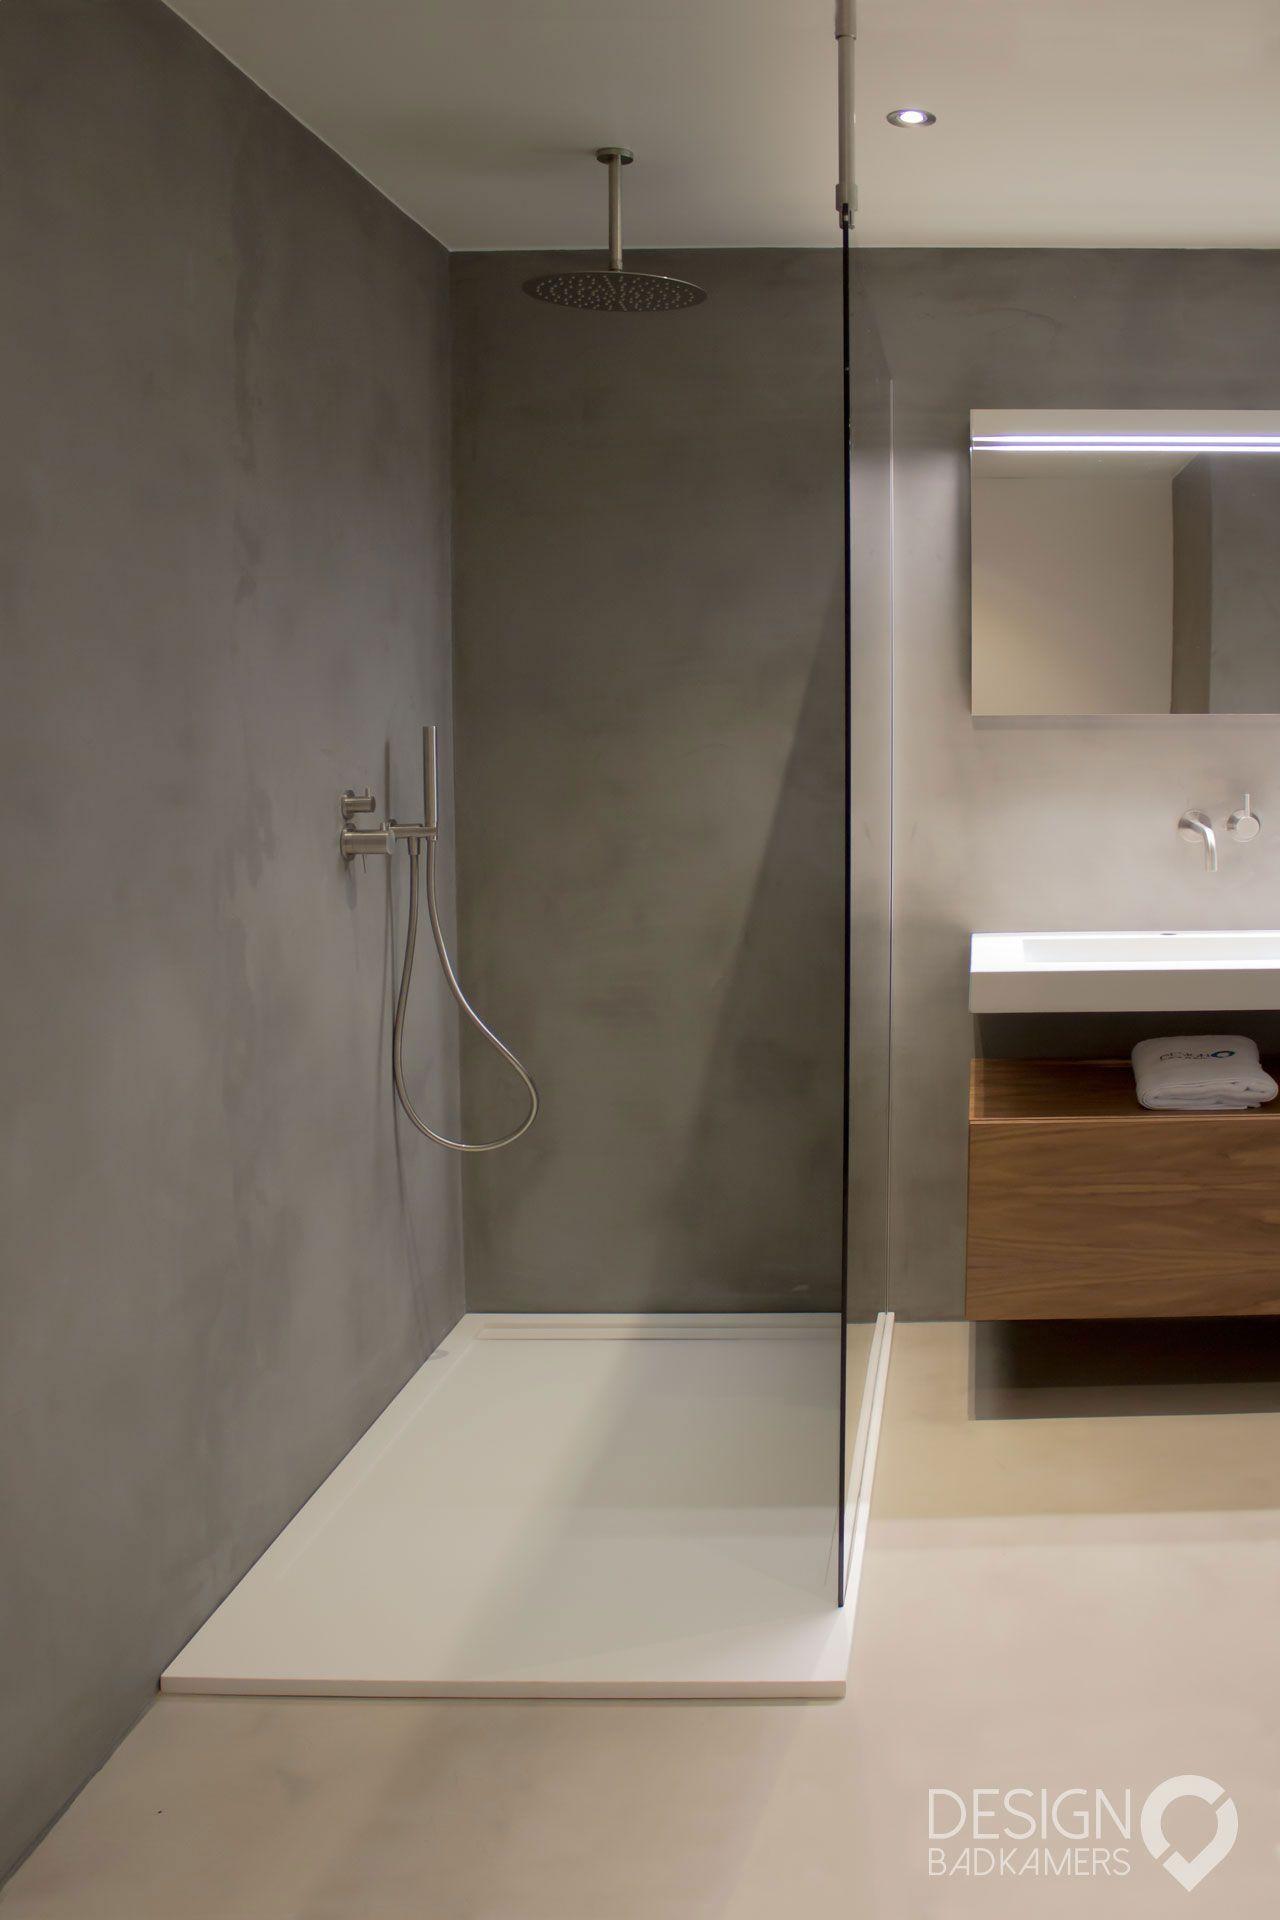 Keptalalat A Kovetkezore Toilette Betonoptik Wohnung